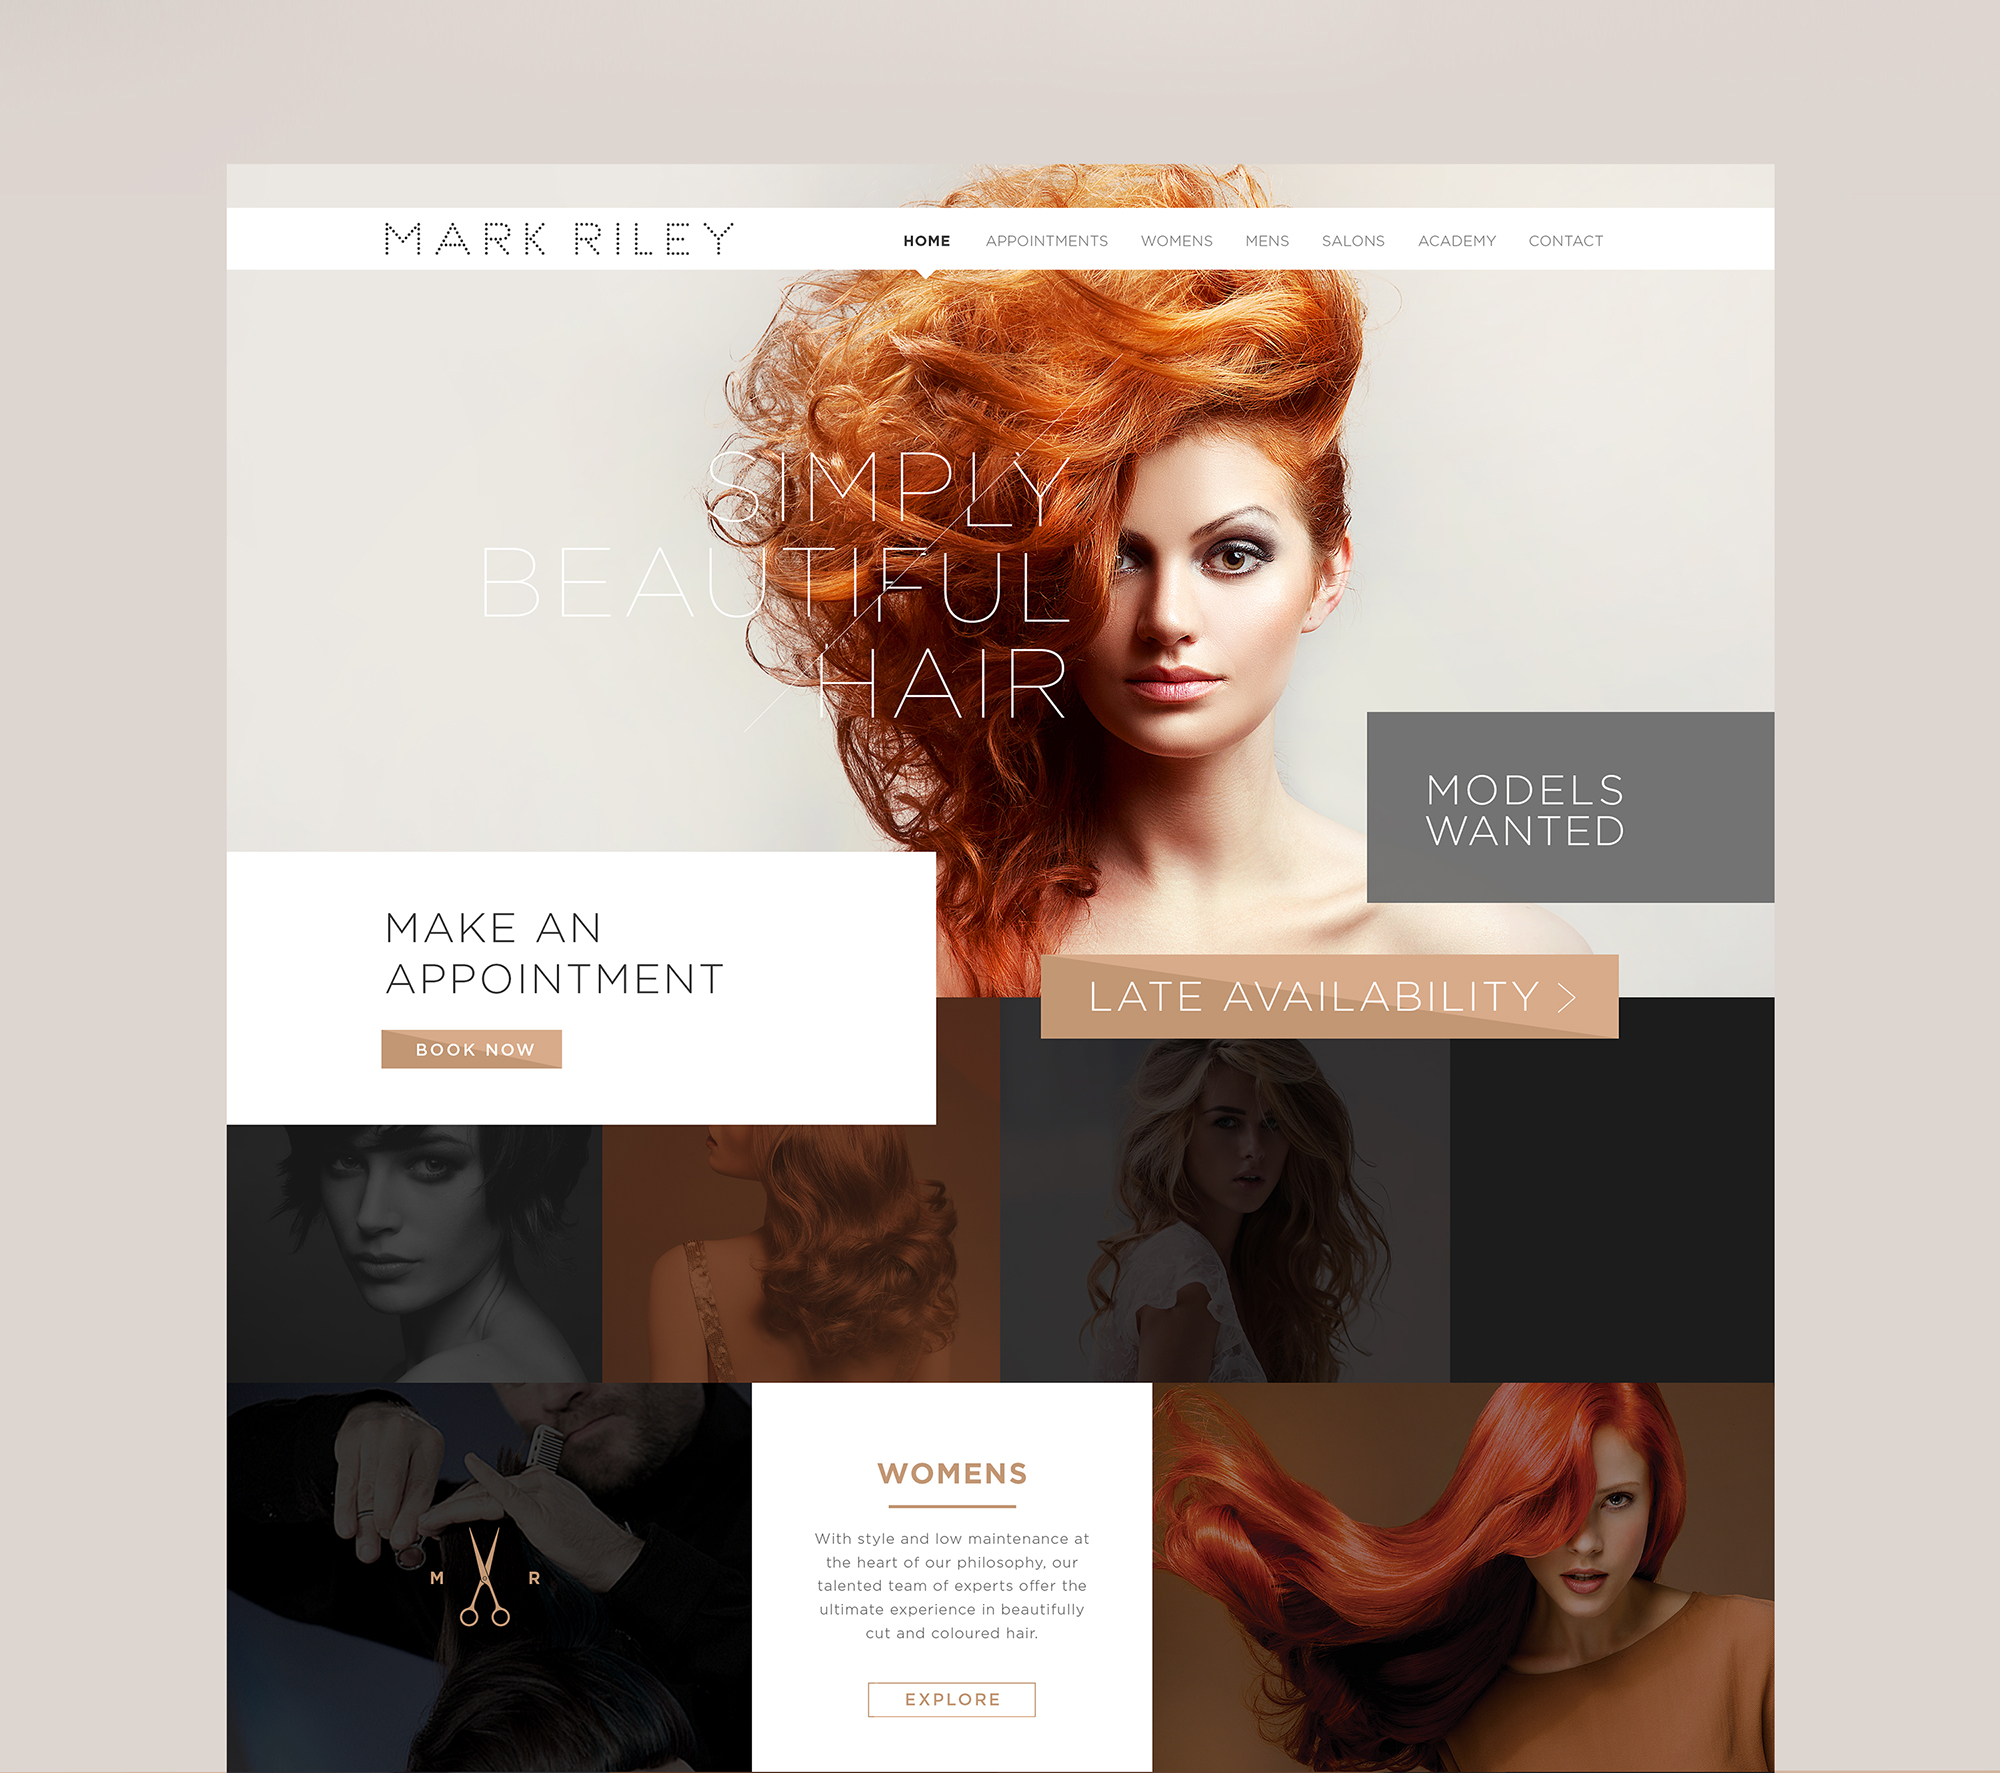 Mark_Riley_website_redesign_02